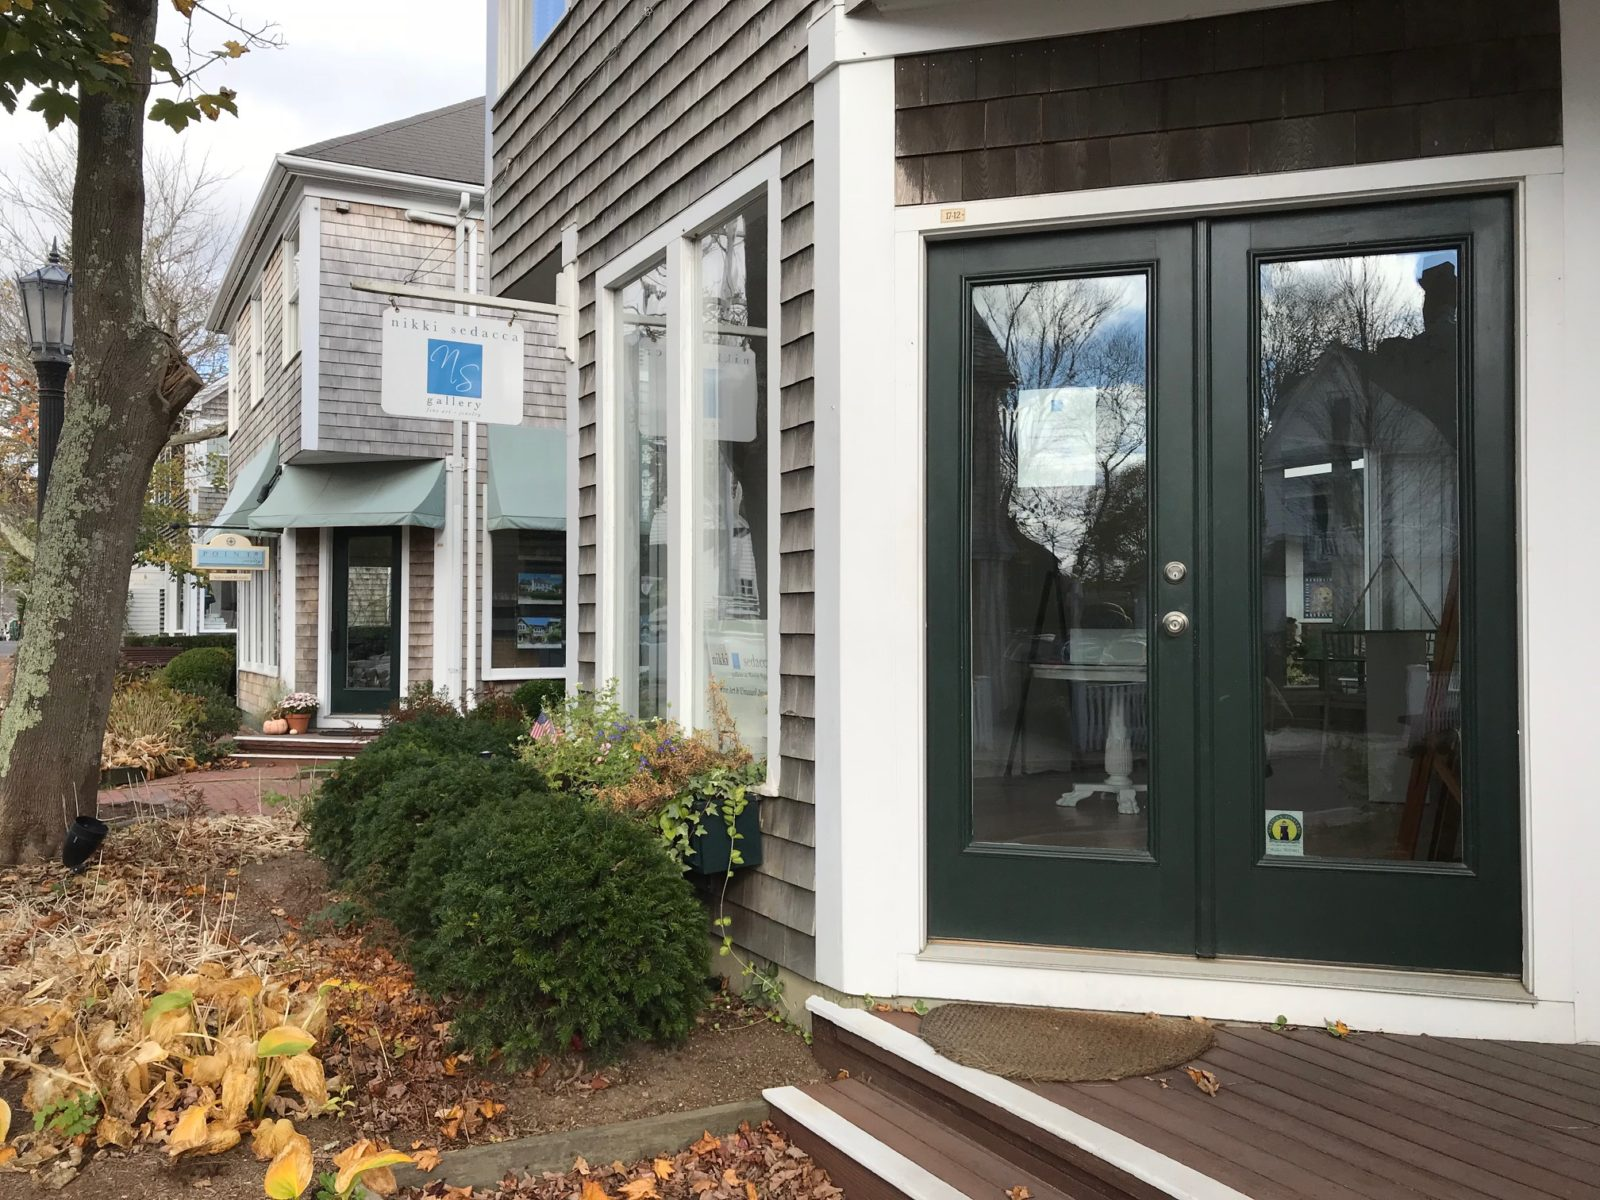 Nikki Sedacca Gallery In Edgartown Becomes Martha's Vineyard Teddy Bear Suite Home For 2019